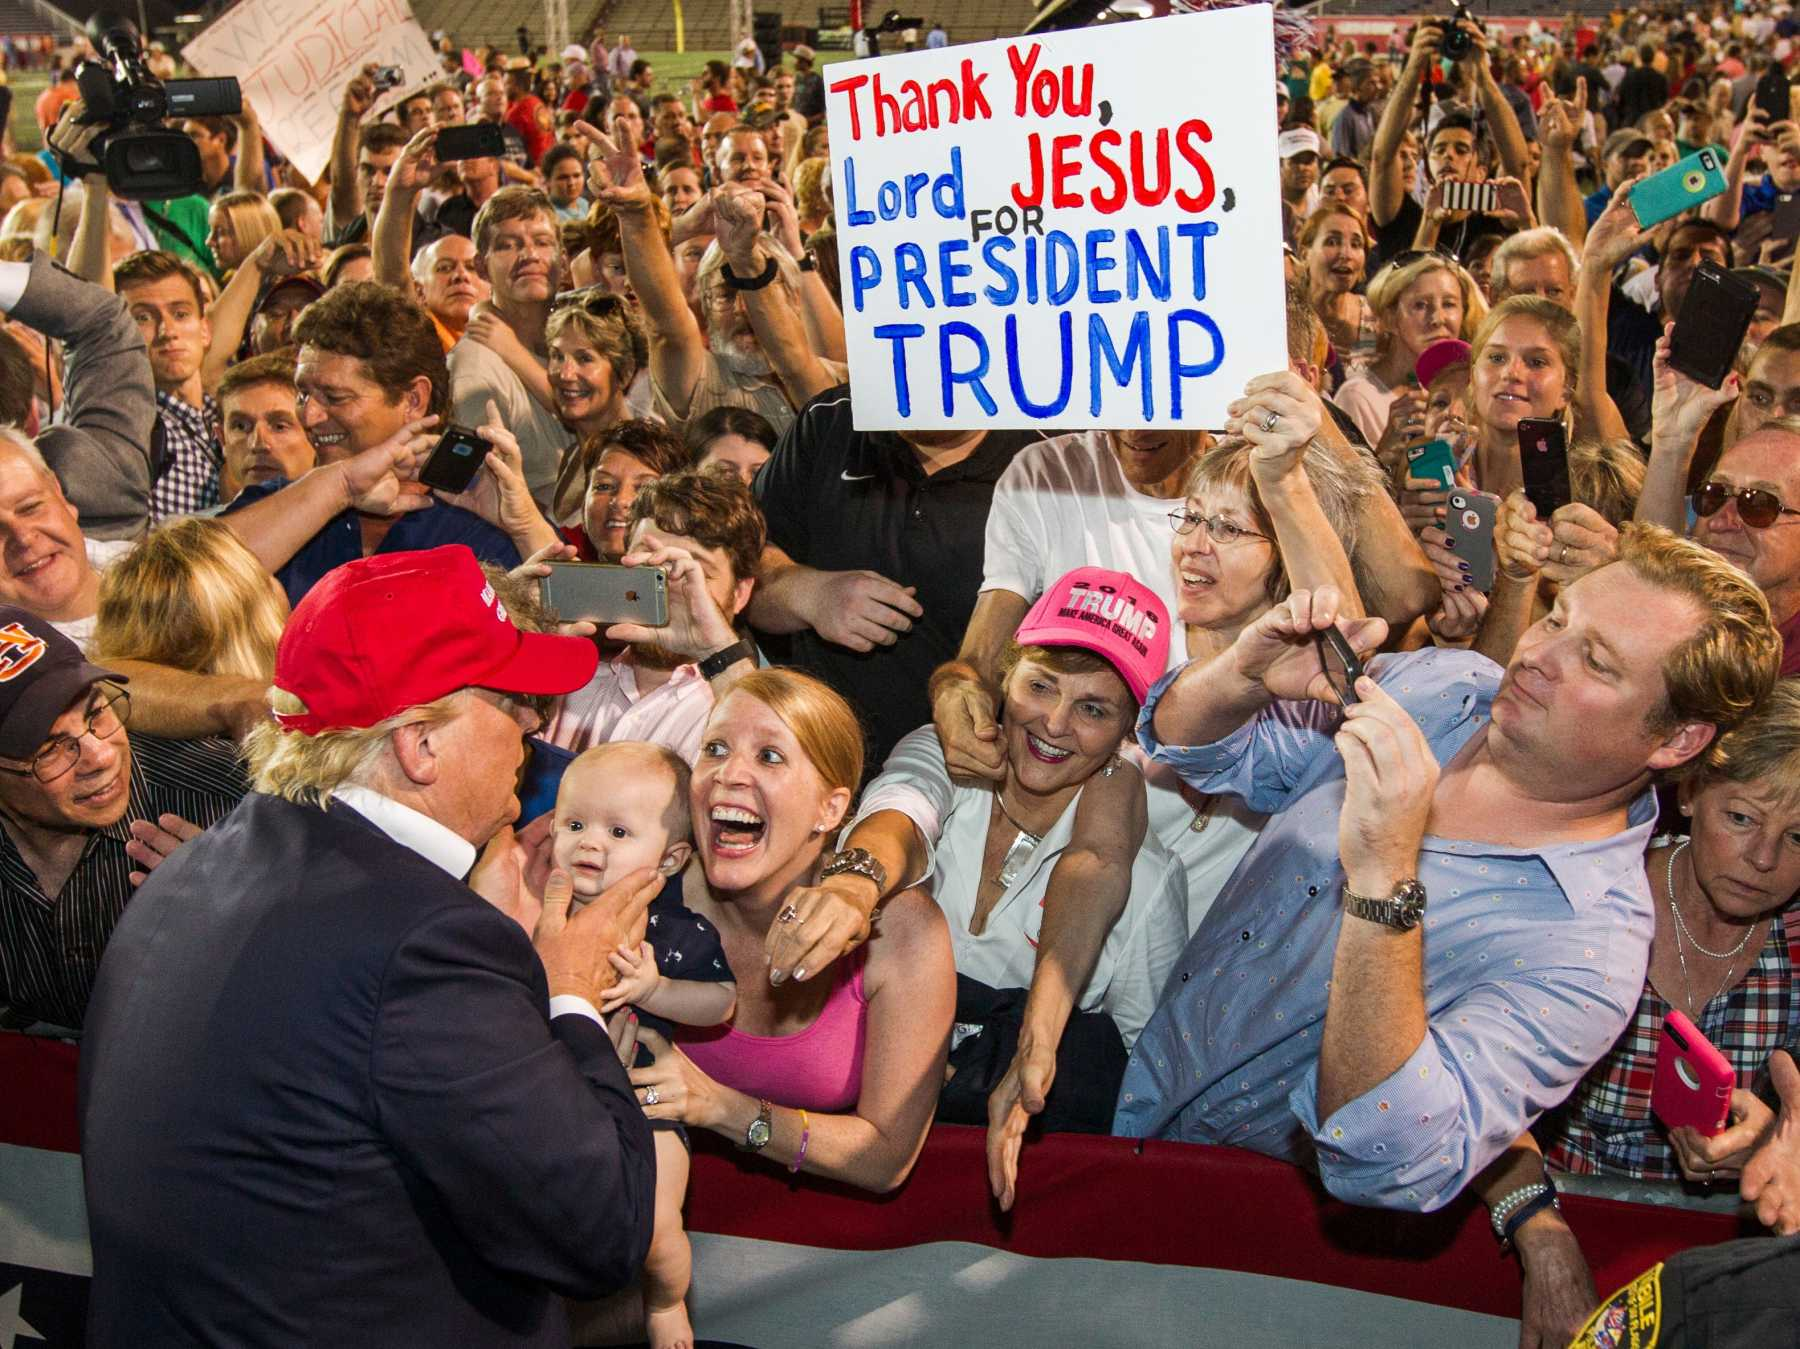 Examining Intolerant Attitudes Among Supporters of Donald Trump   Donald Trump